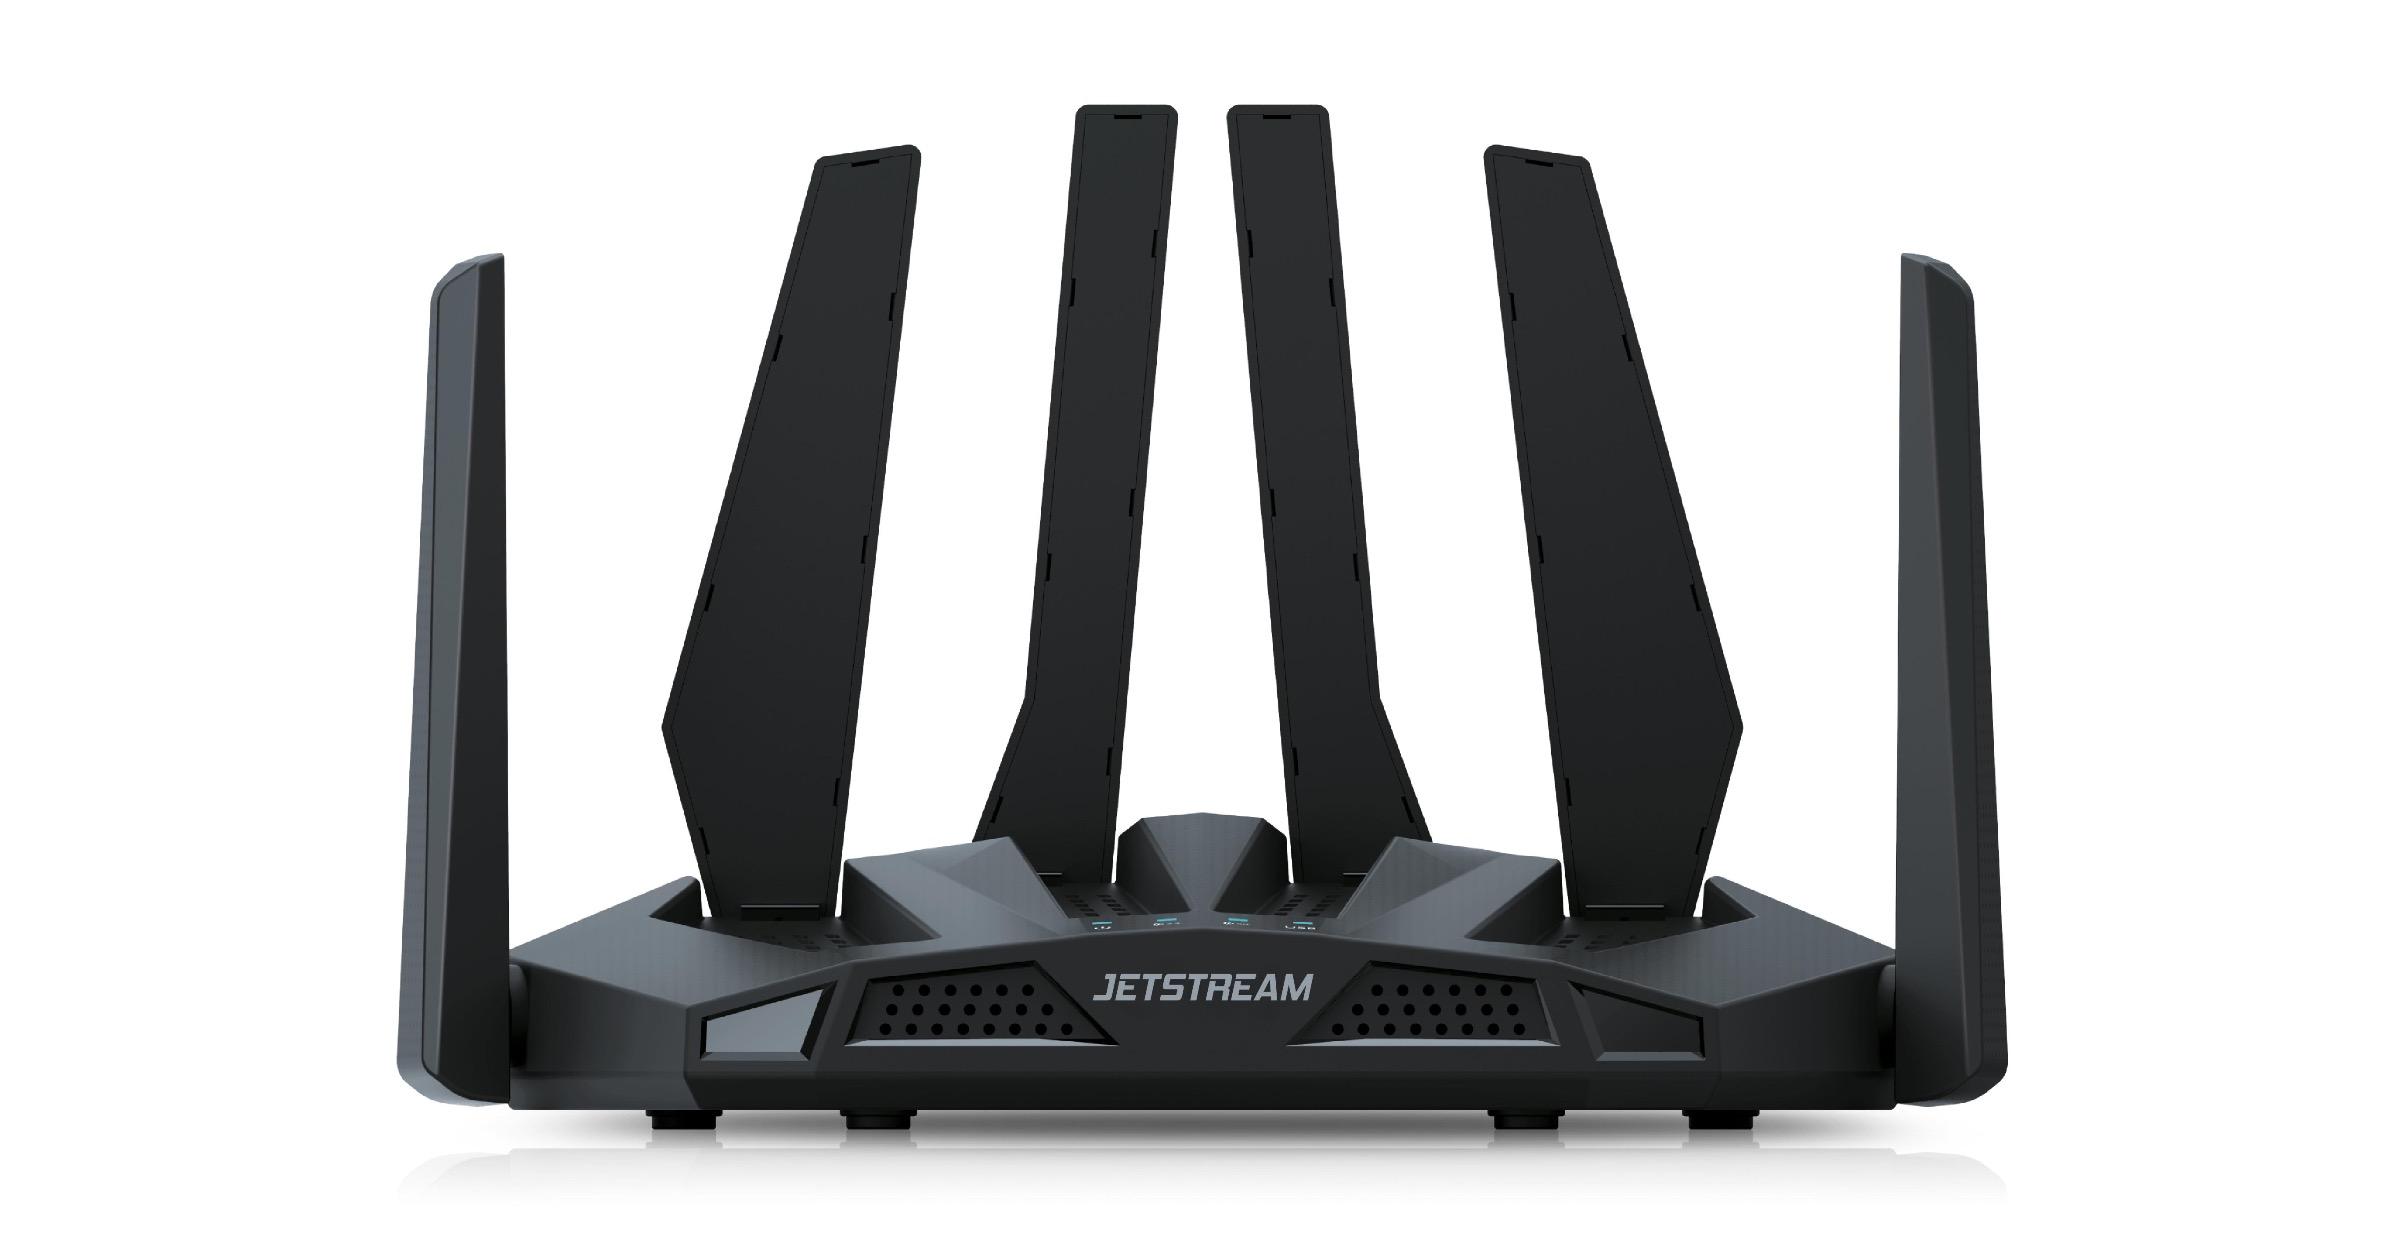 Walmart Jetstream router